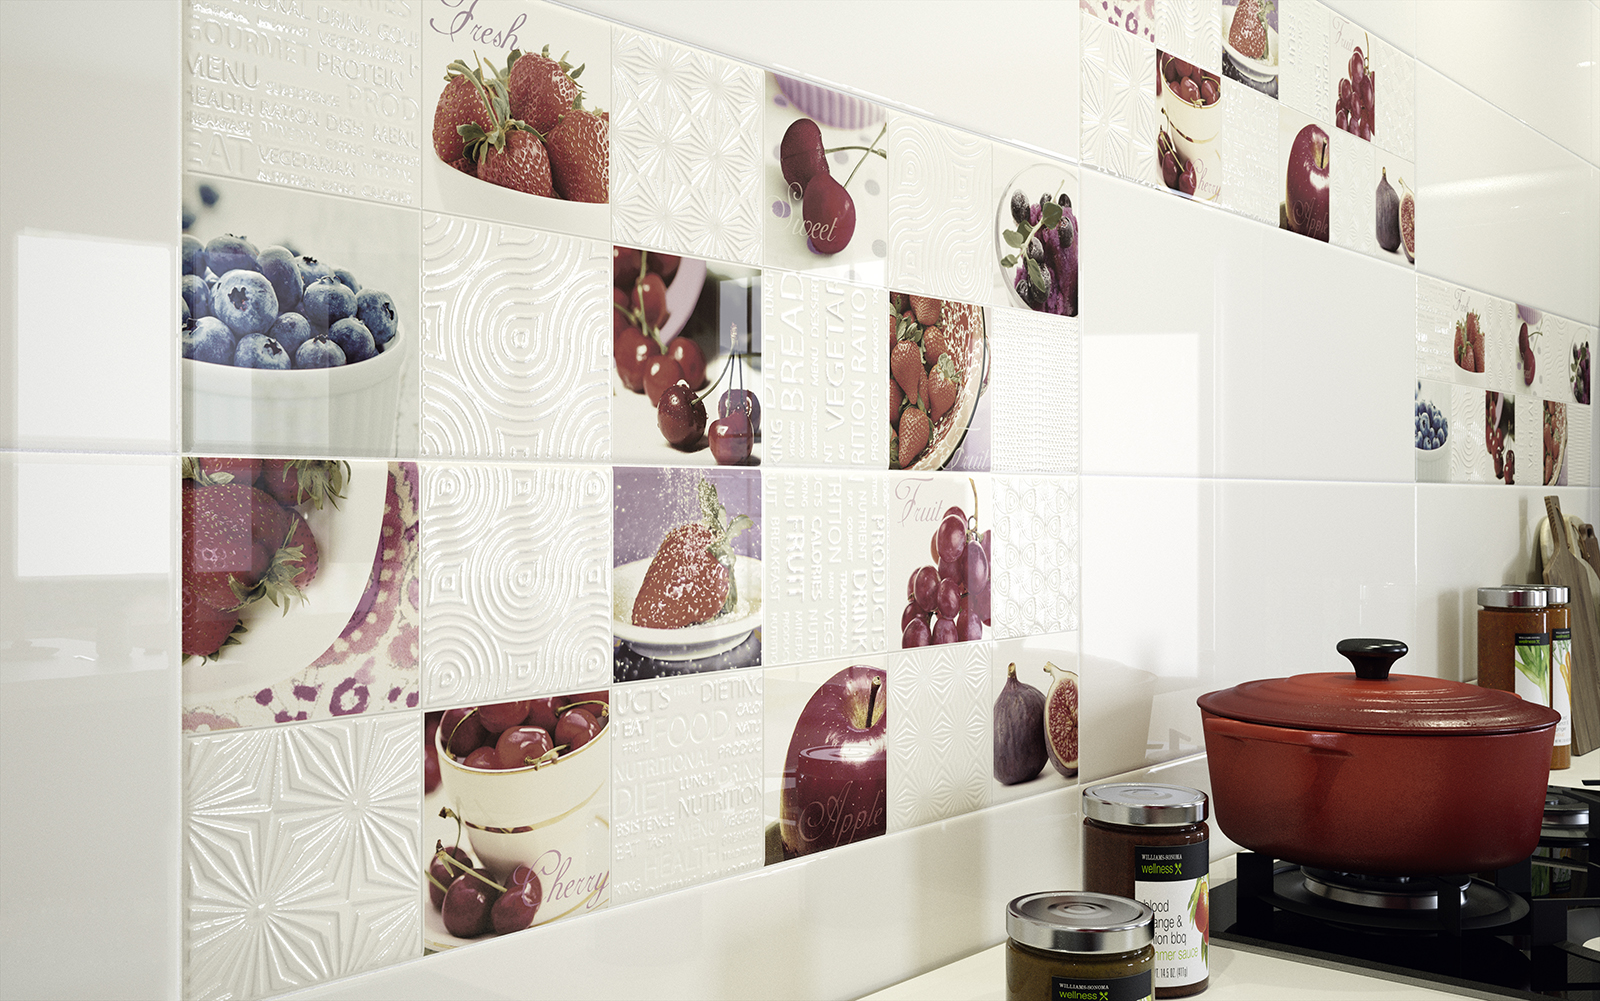 Diamond piastrelle in ceramica per cucina marazzi - Piastrelle di ceramica ...